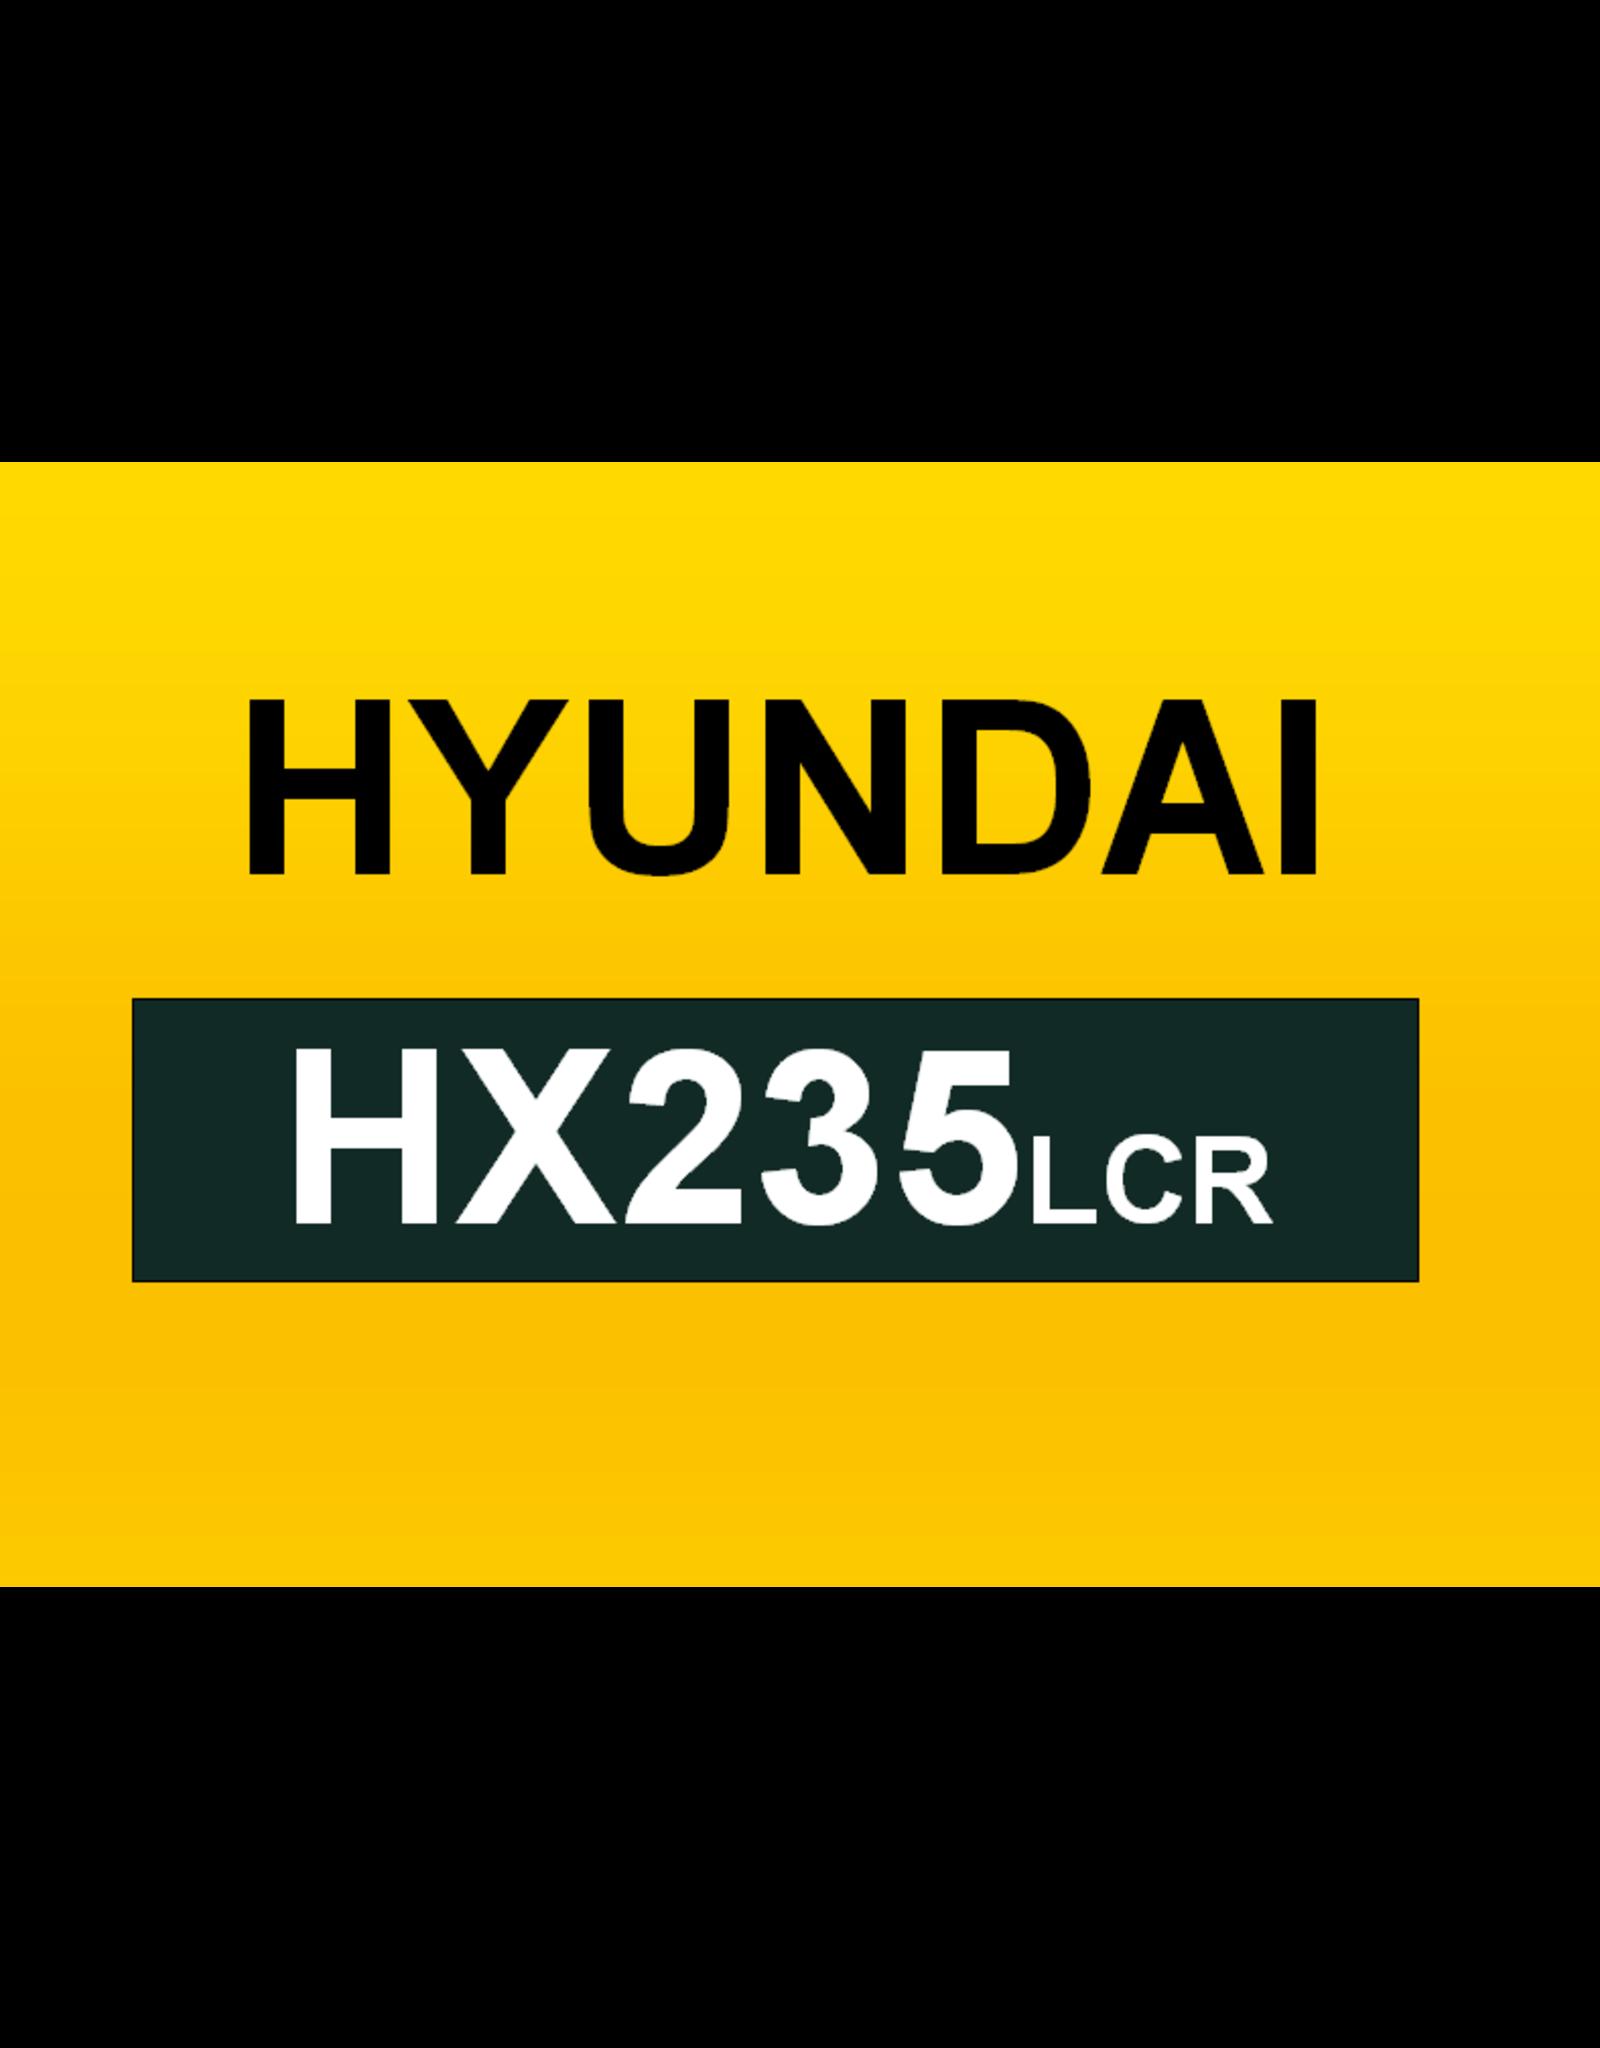 Echle Hartstahl GmbH FOPS pour Hyundai HX235LCR